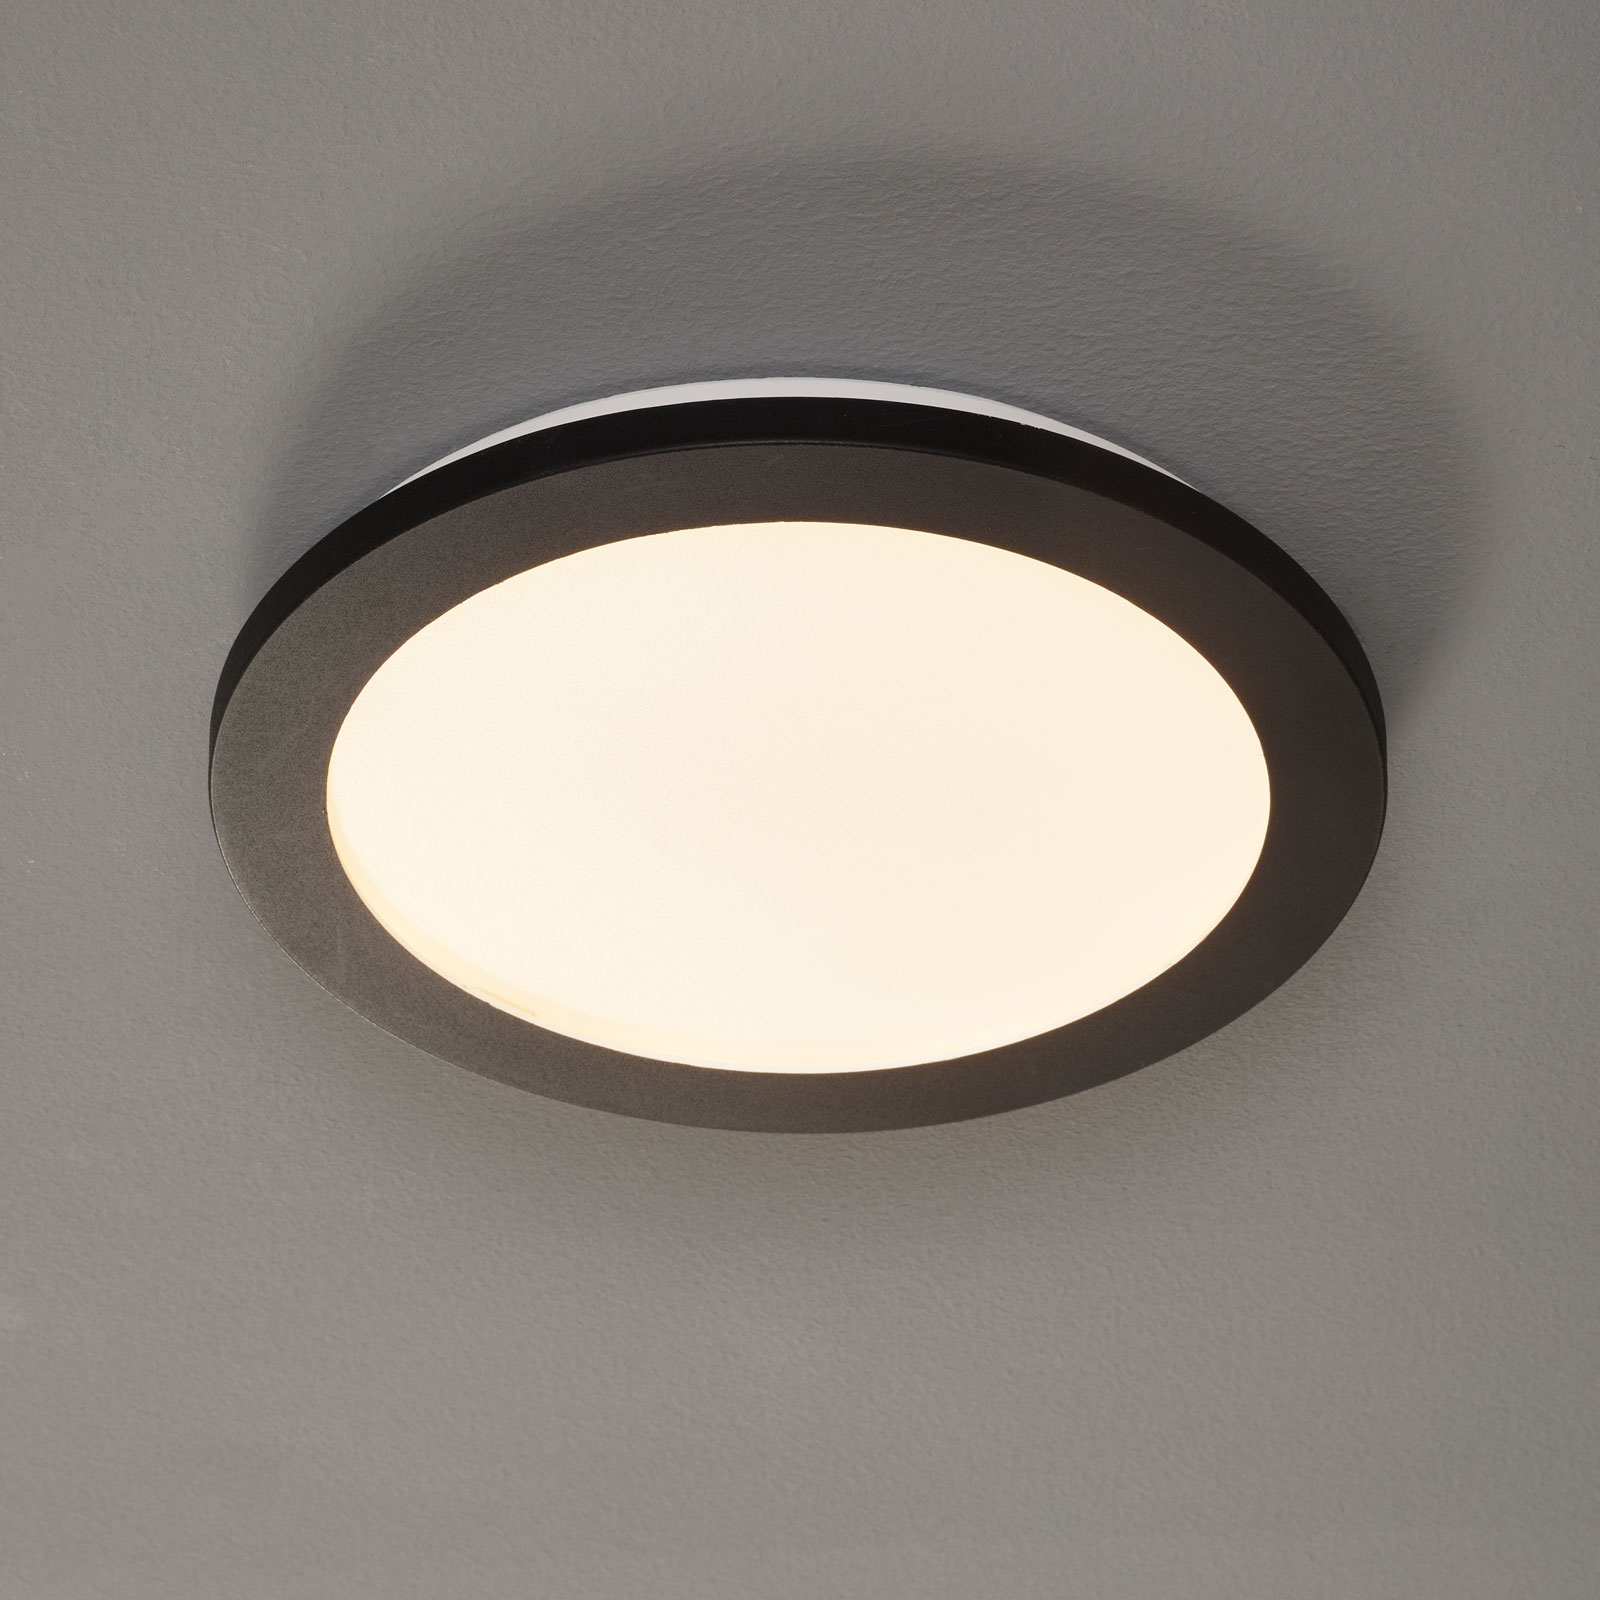 Lampa sufitowa LED Camillus, okrągła, Ø 26 cm